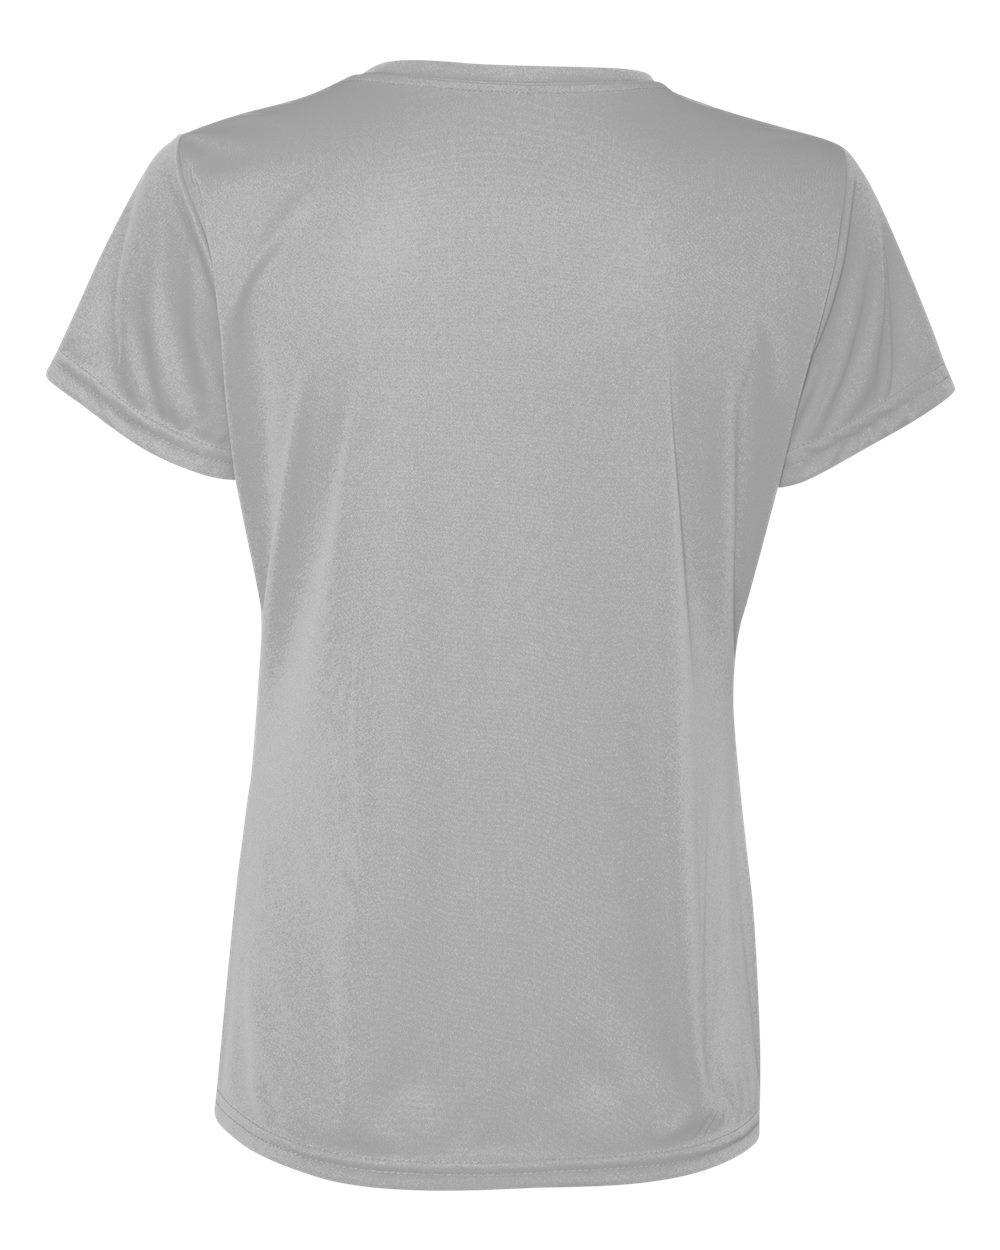 Augusta-Sportswear-Women-039-s-Moisture-Wicking-V-Neck-T-Shirt-1790-XS-2XL thumbnail 7